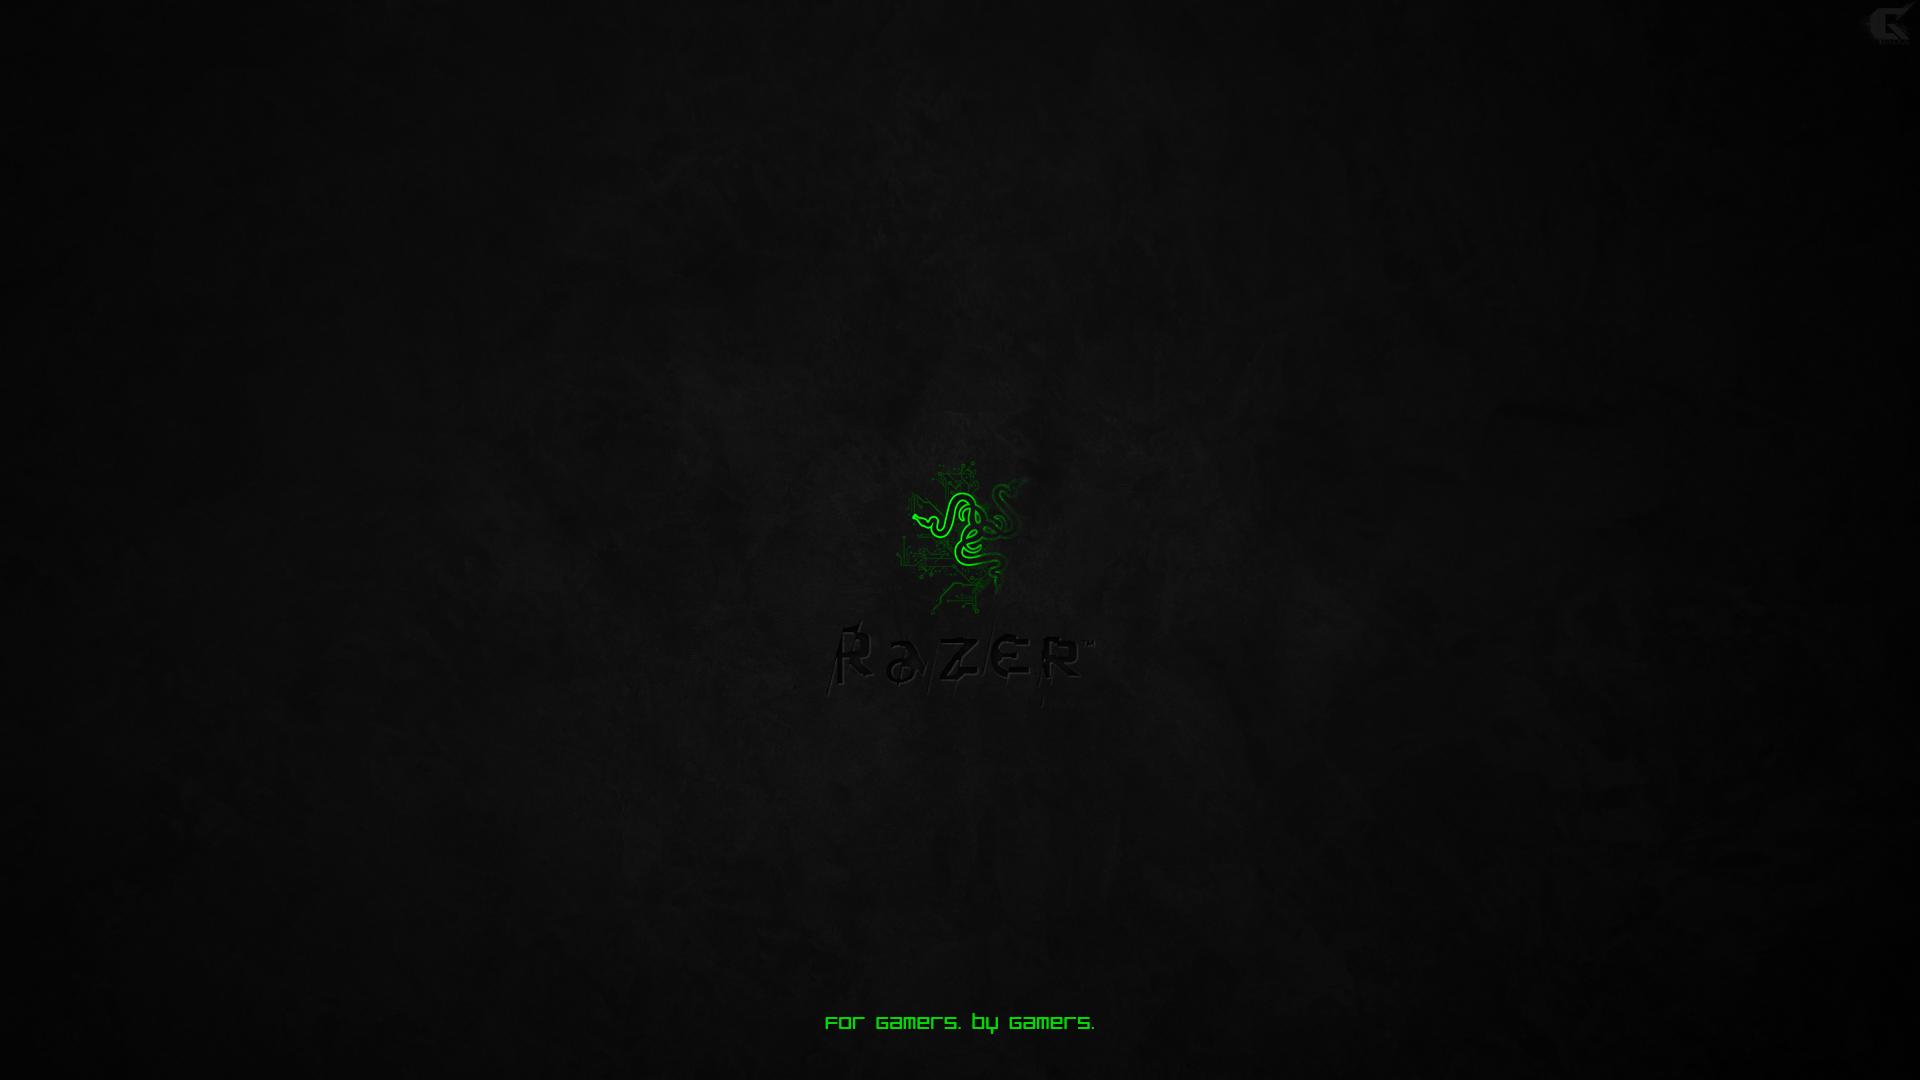 Razer Wallpapers HD 1920x1080